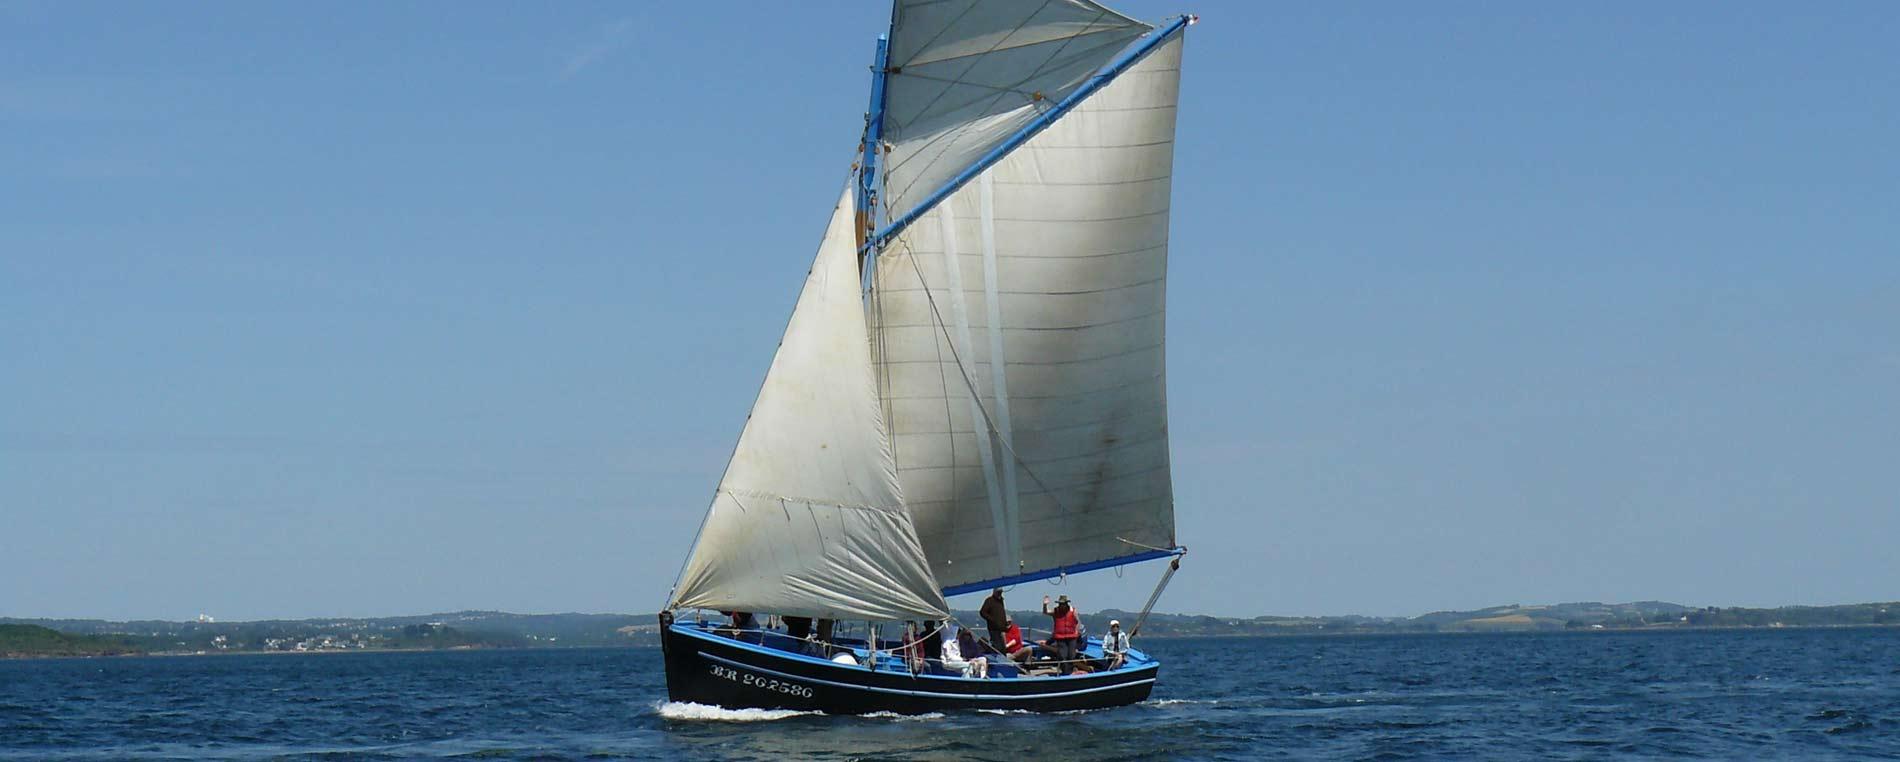 Spécial entreprises : une balade en mer en rade de Brest